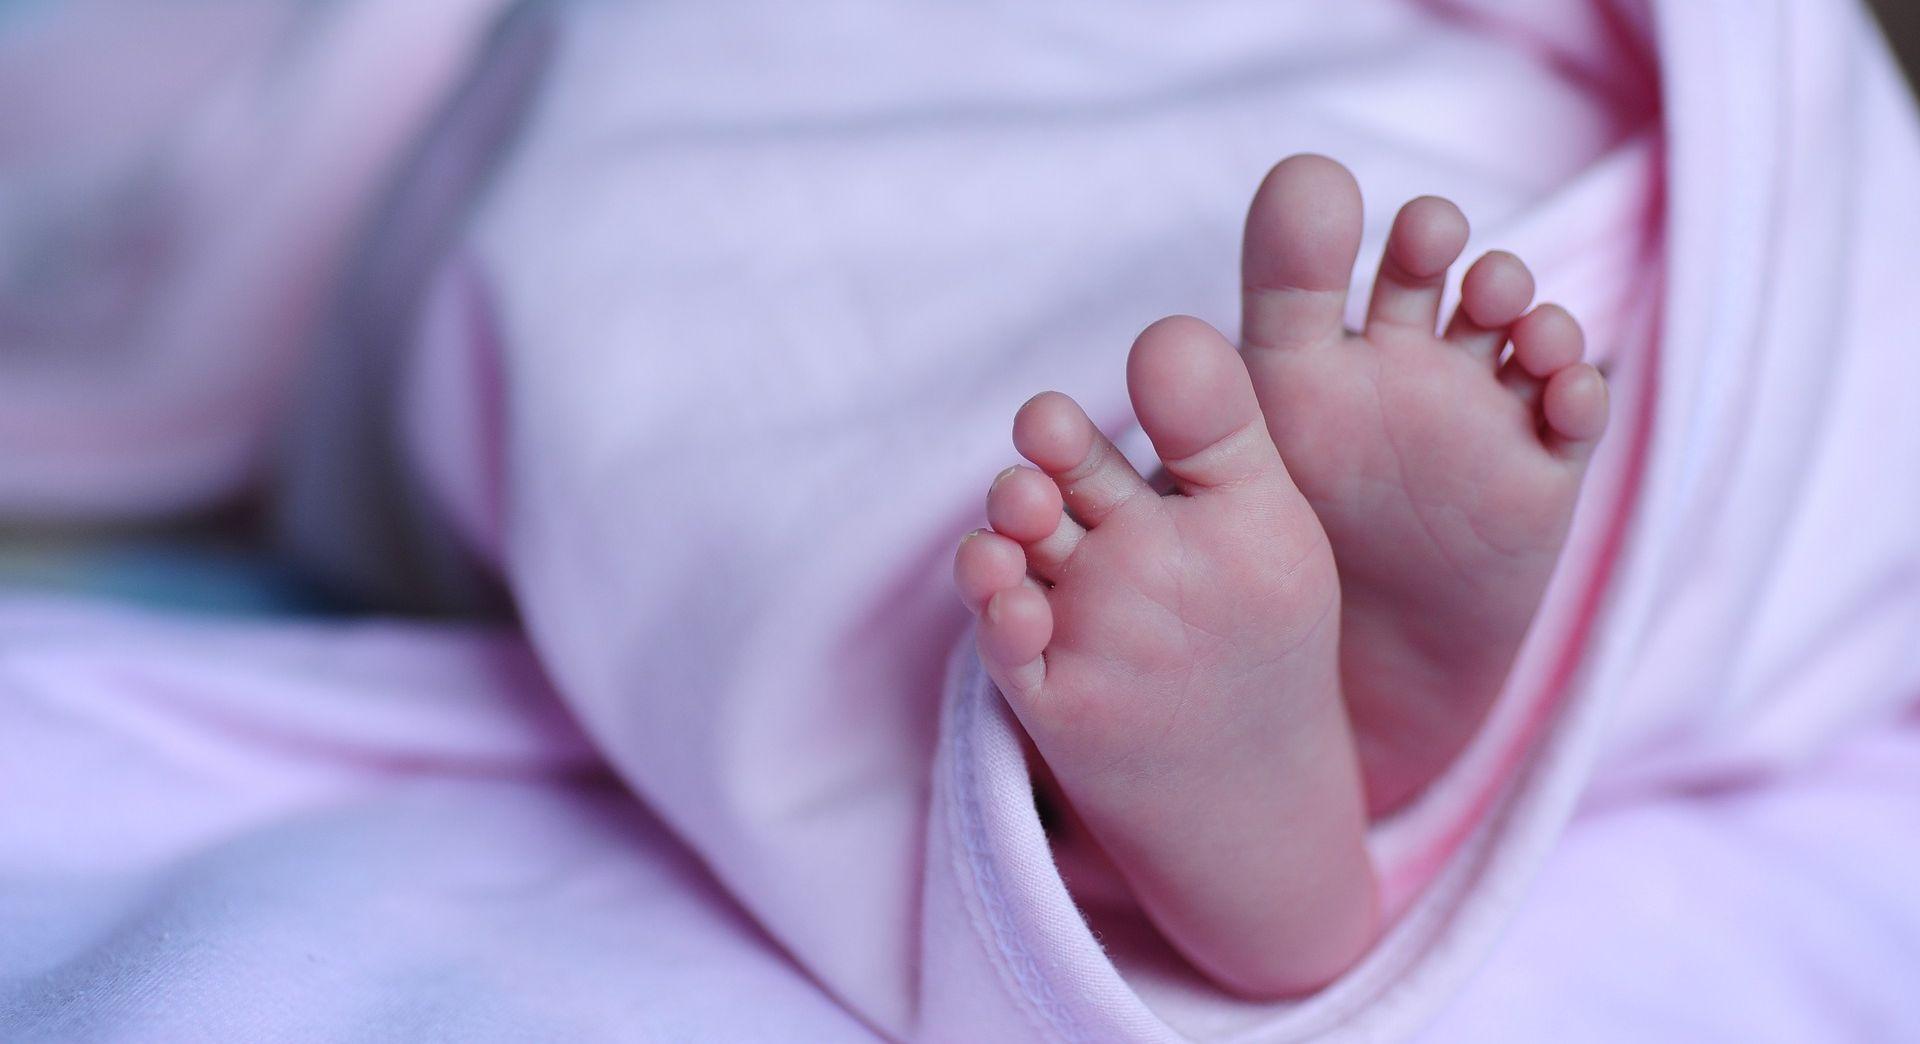 PRVI SLUČAJ U EUROPI Španjolka zaražena zikom rodila dijete s mikrocefalijom